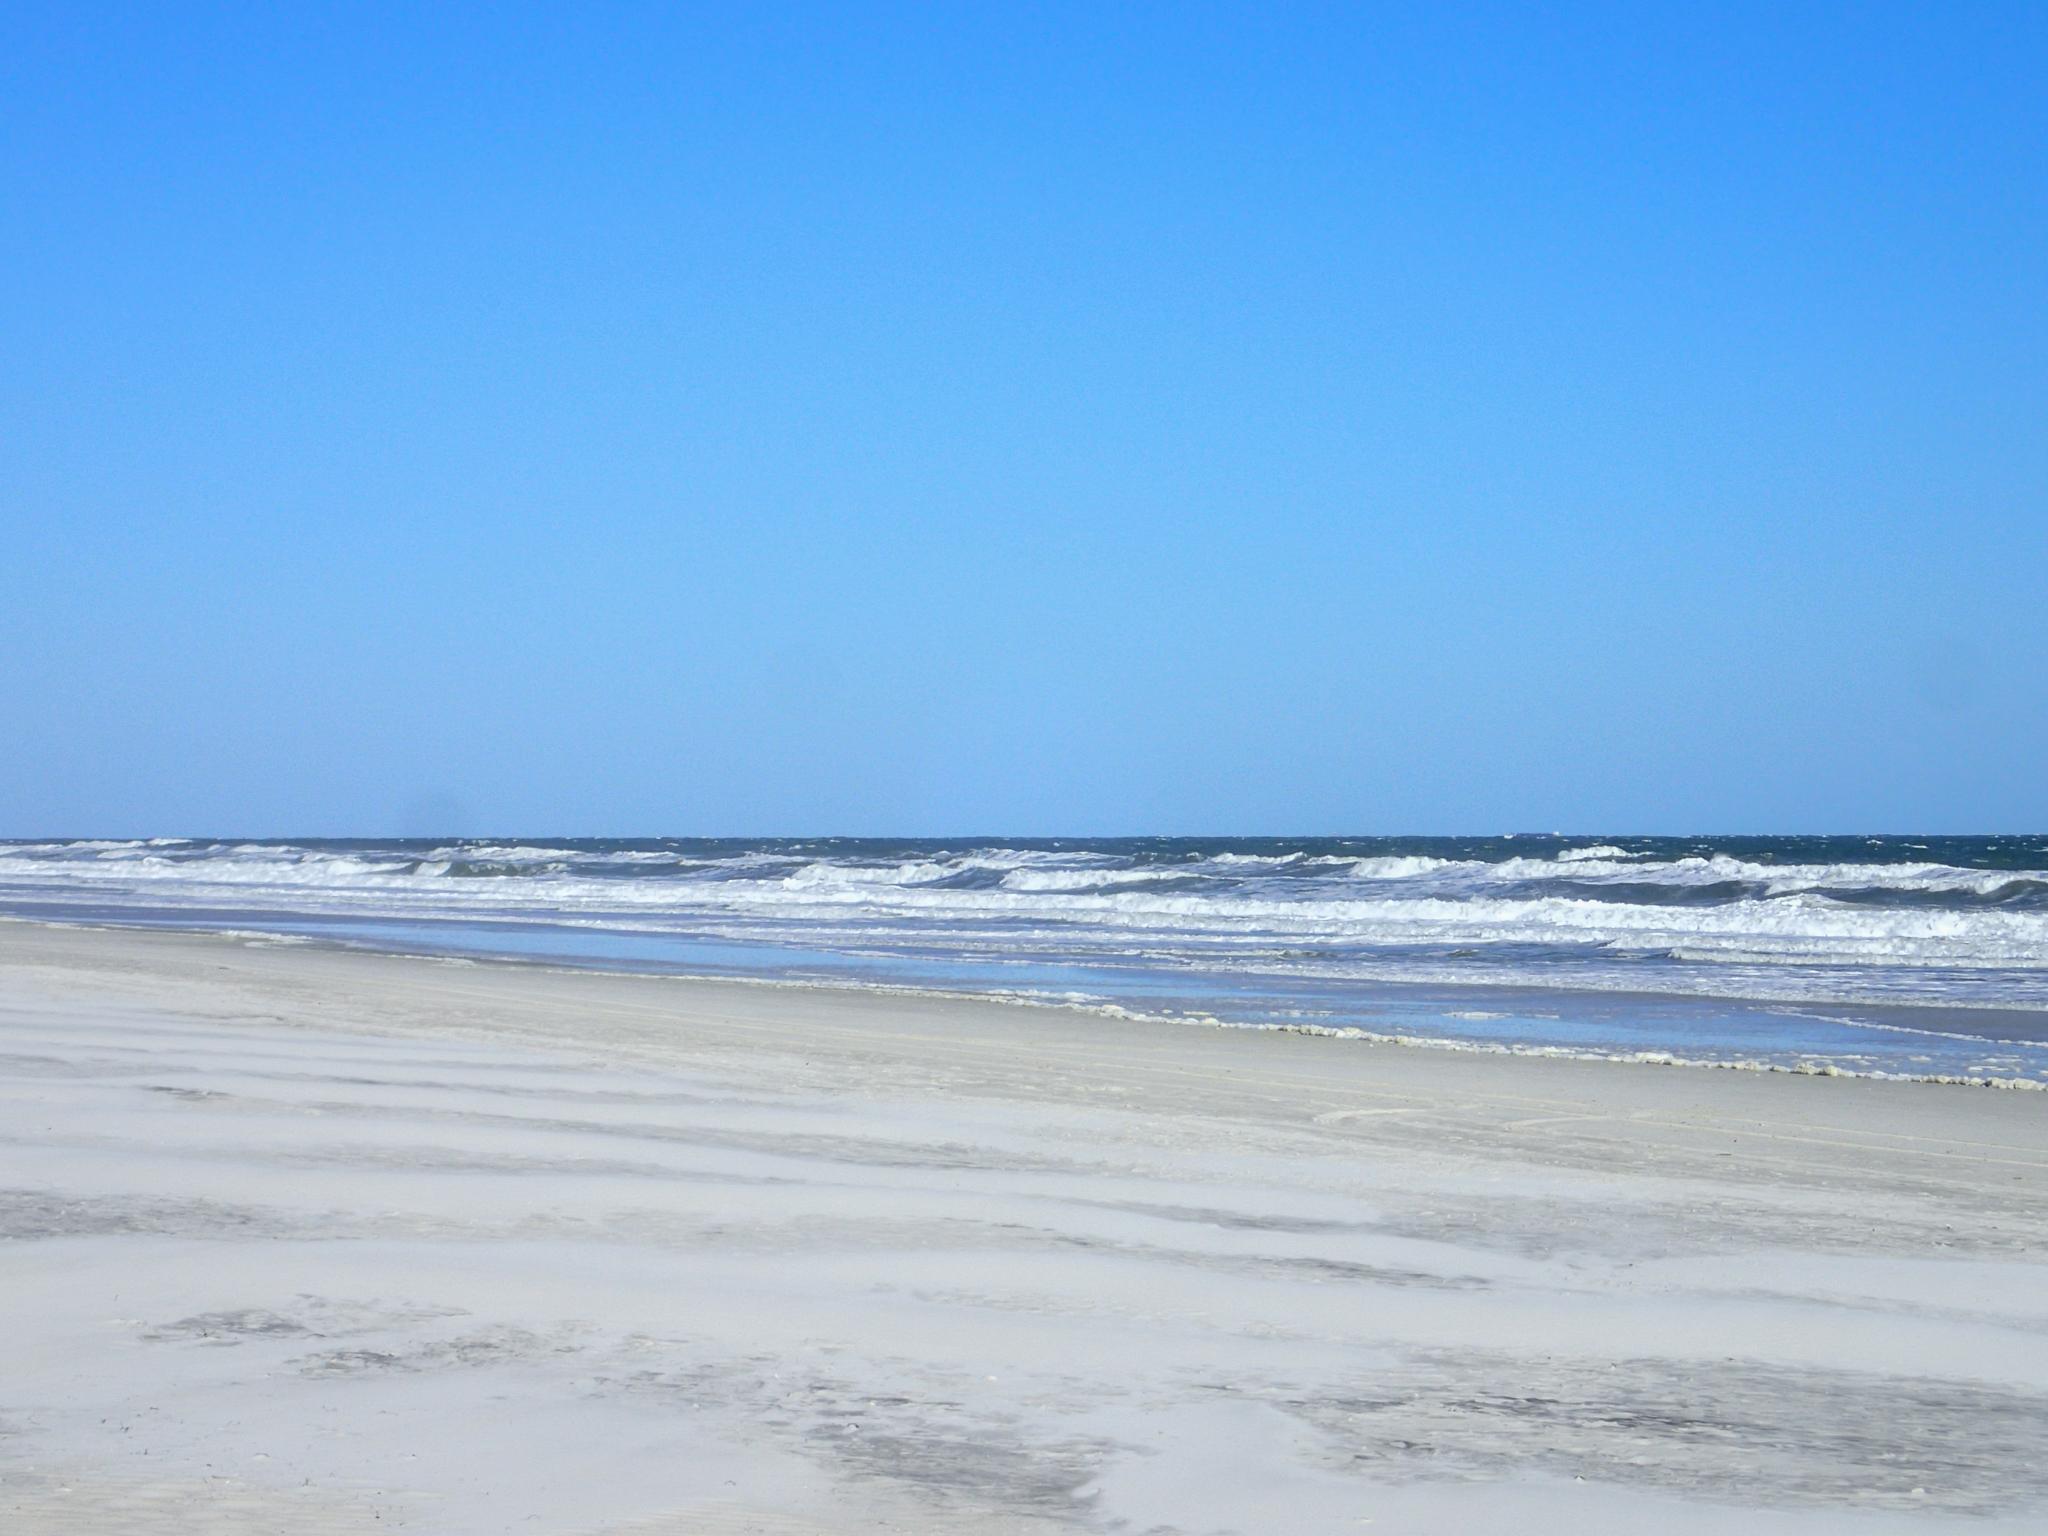 The Atlantic Ocean at Jacksonville Beach, Florida, USA